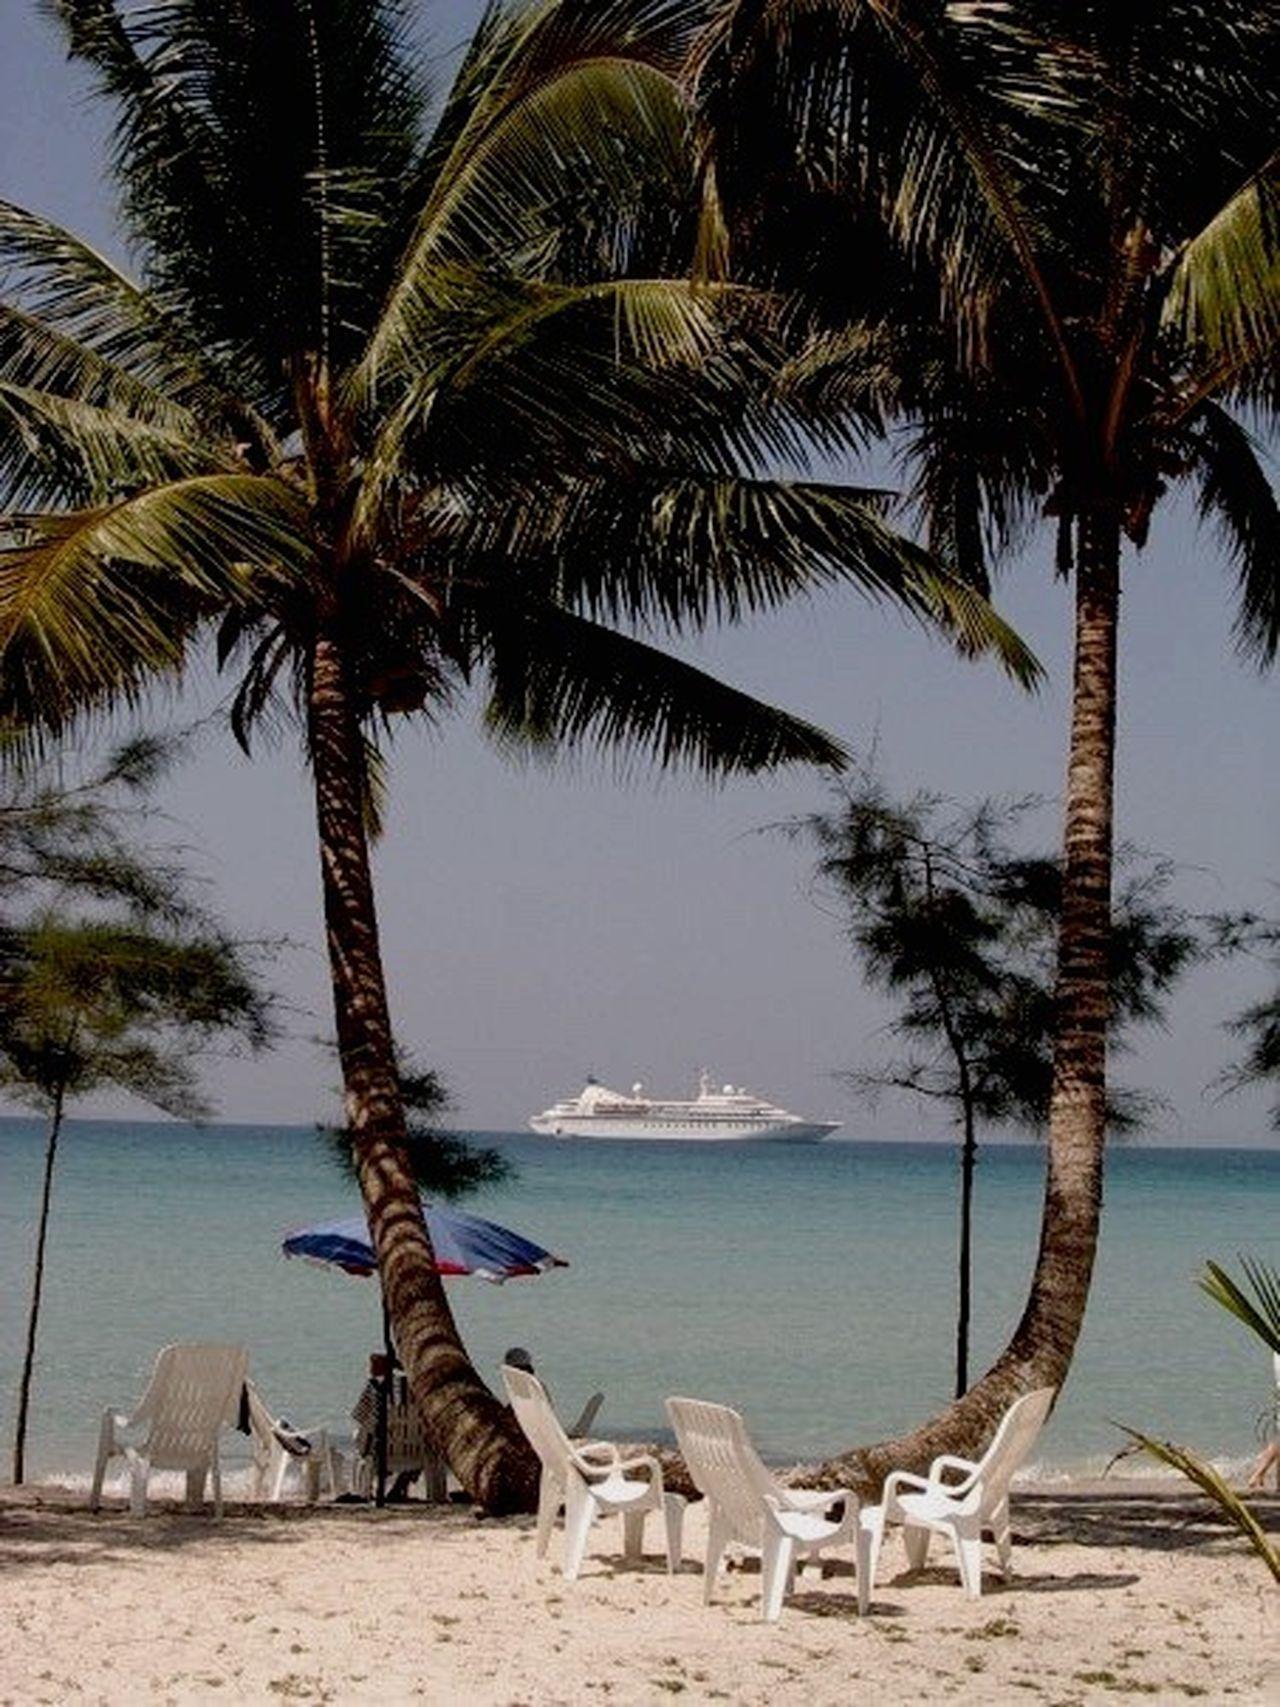 Seabourn Spirit Cruise Ships Thailand Ko Kut Island